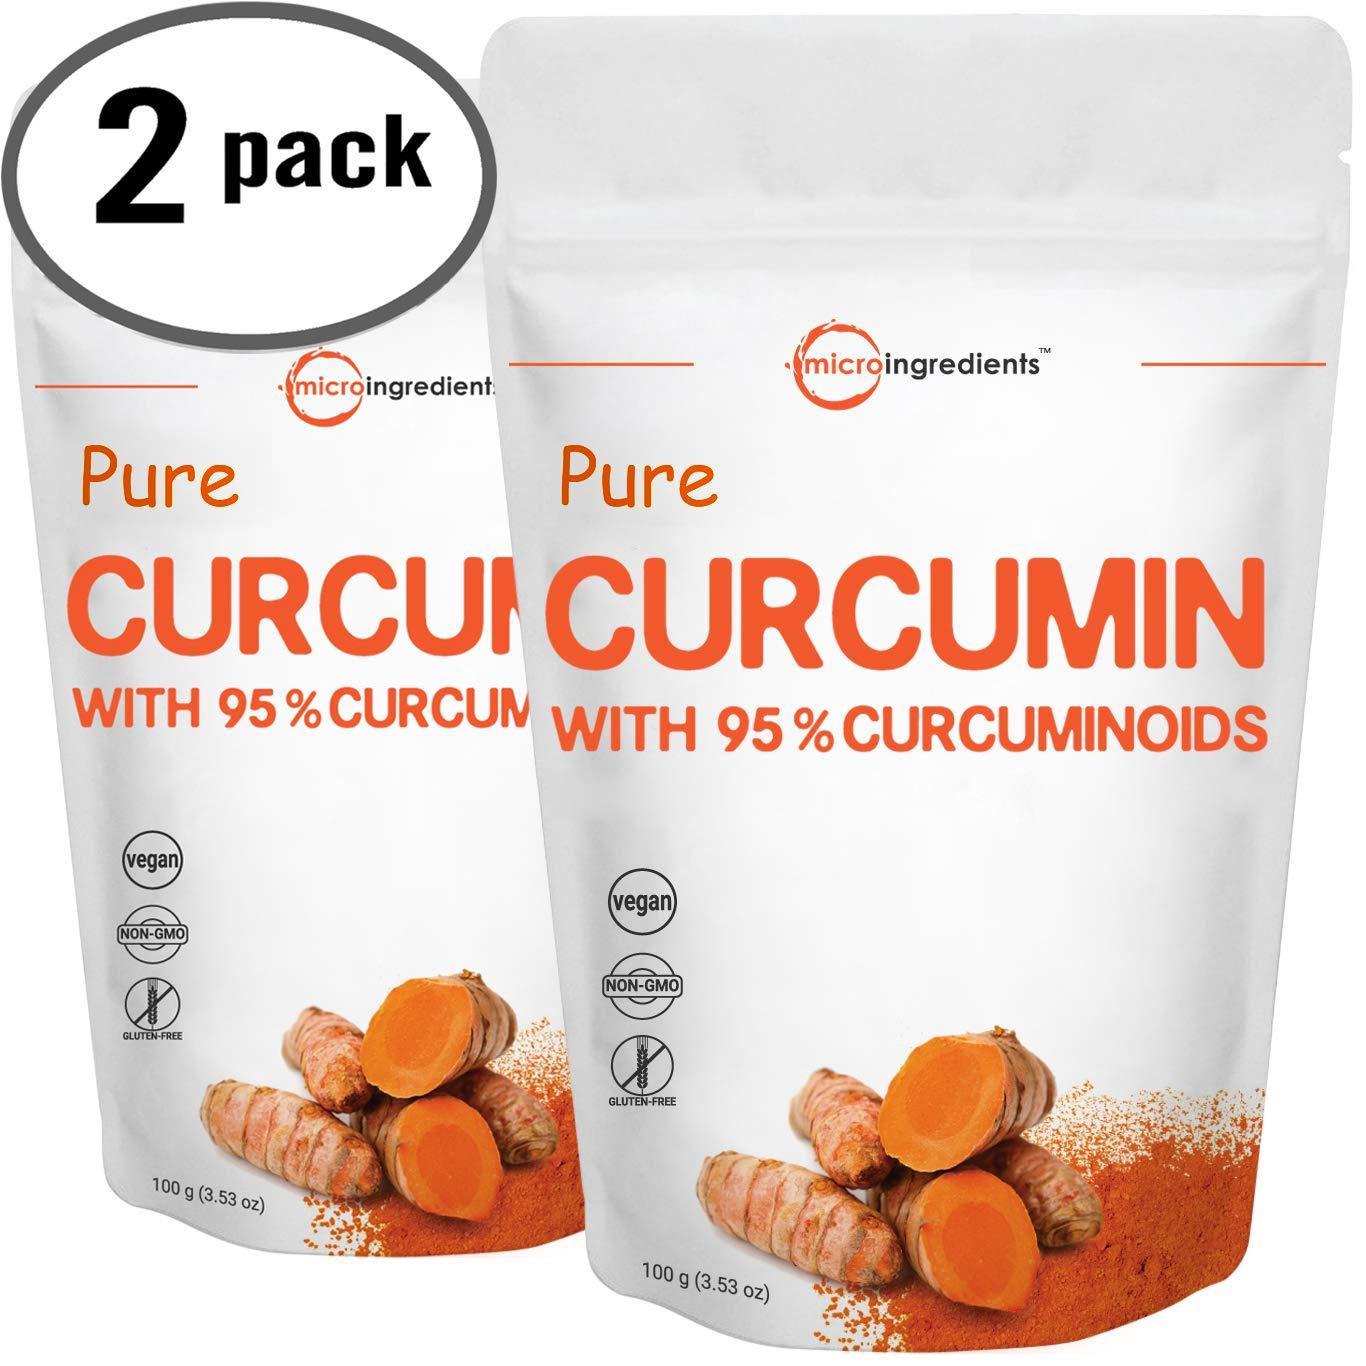 Maximum Strength Organic Pure Curcumin 95% (Natural Turmeric Extract) Powder, Rich in Antioxidants for Joint Support, 100 Gram (2 Pack).Vegan Friendly